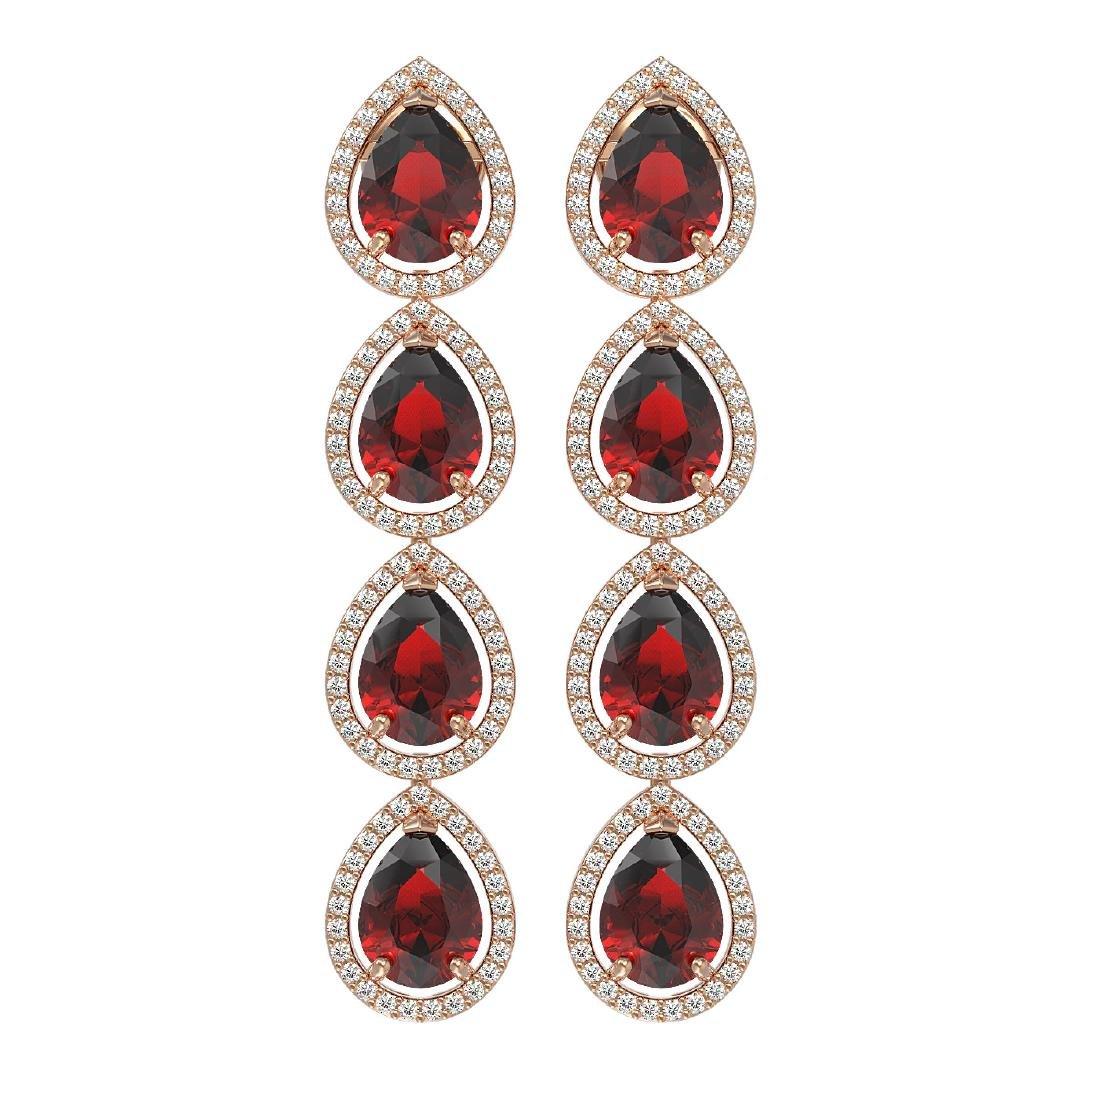 9.25 CTW Garnet & Diamond Halo Earrings 10K Rose Gold